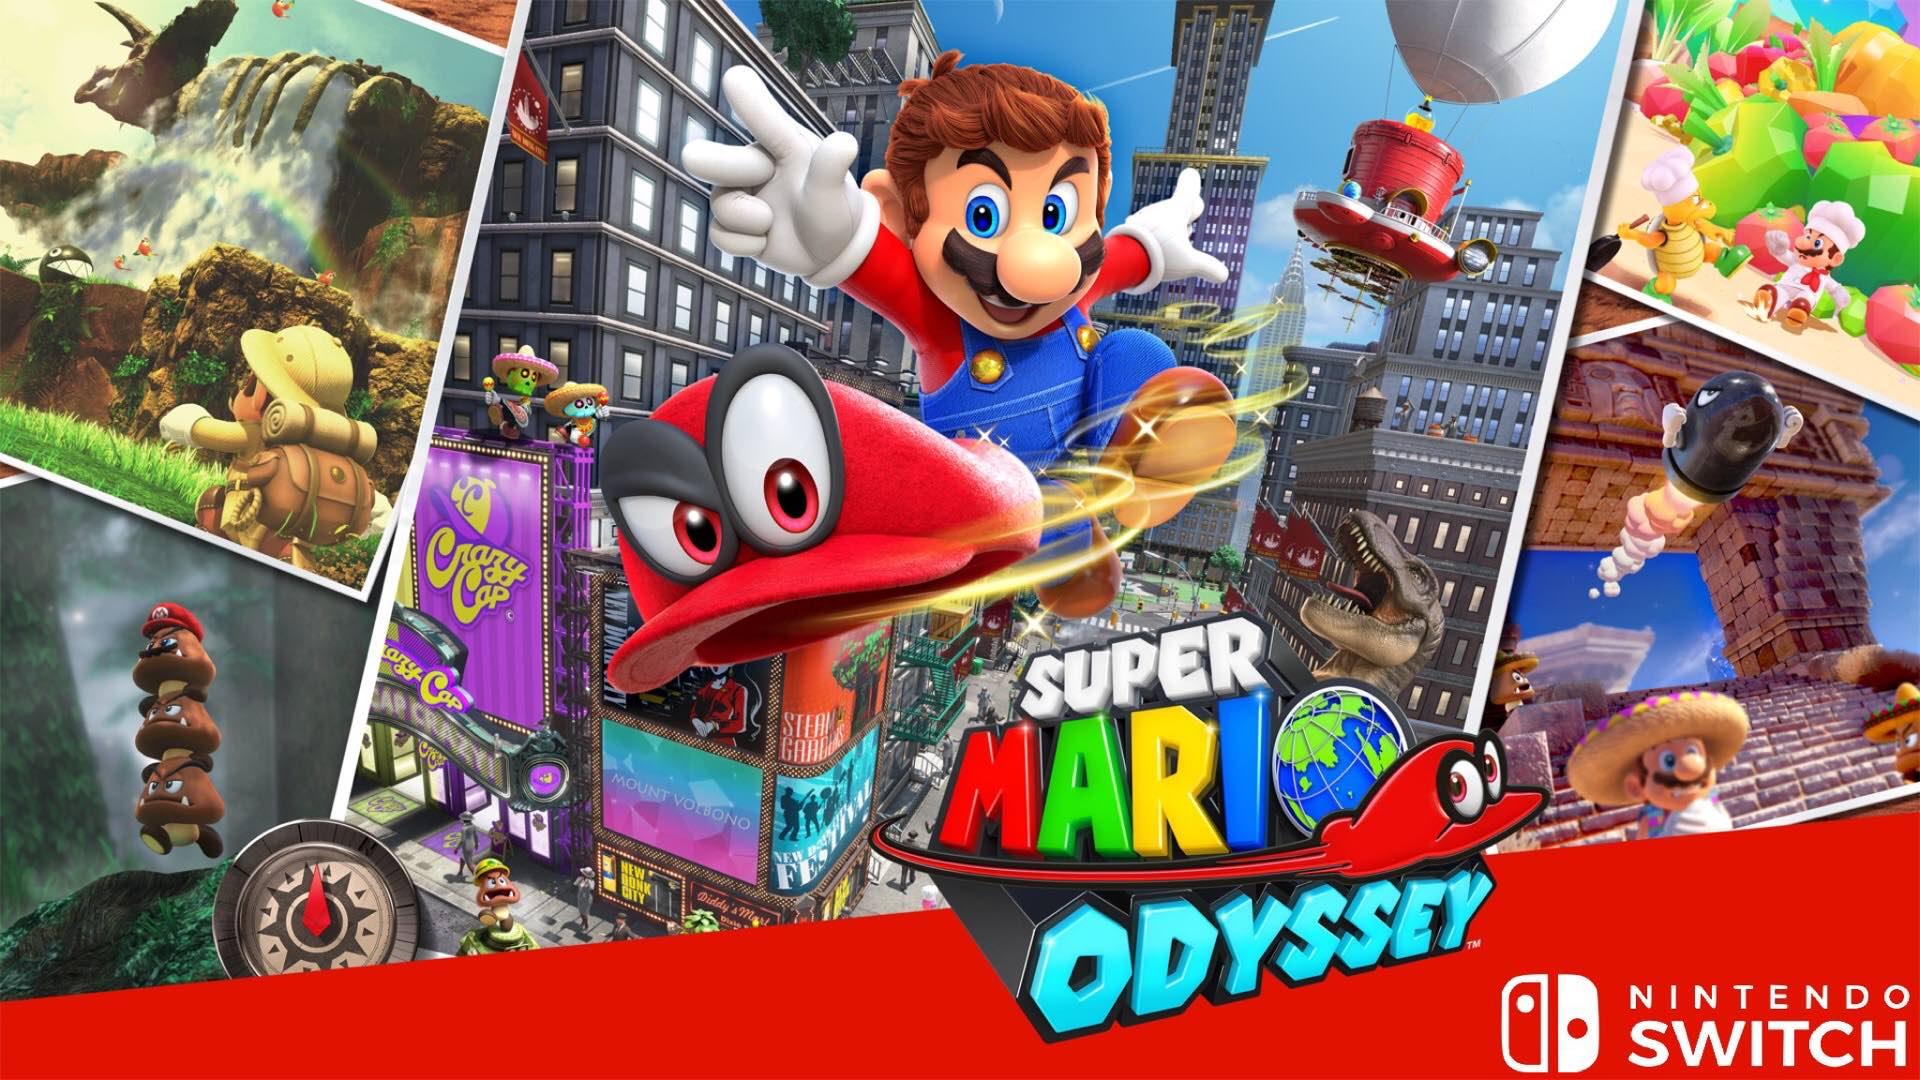 super-mario-odyssey-for-nintendo-switch